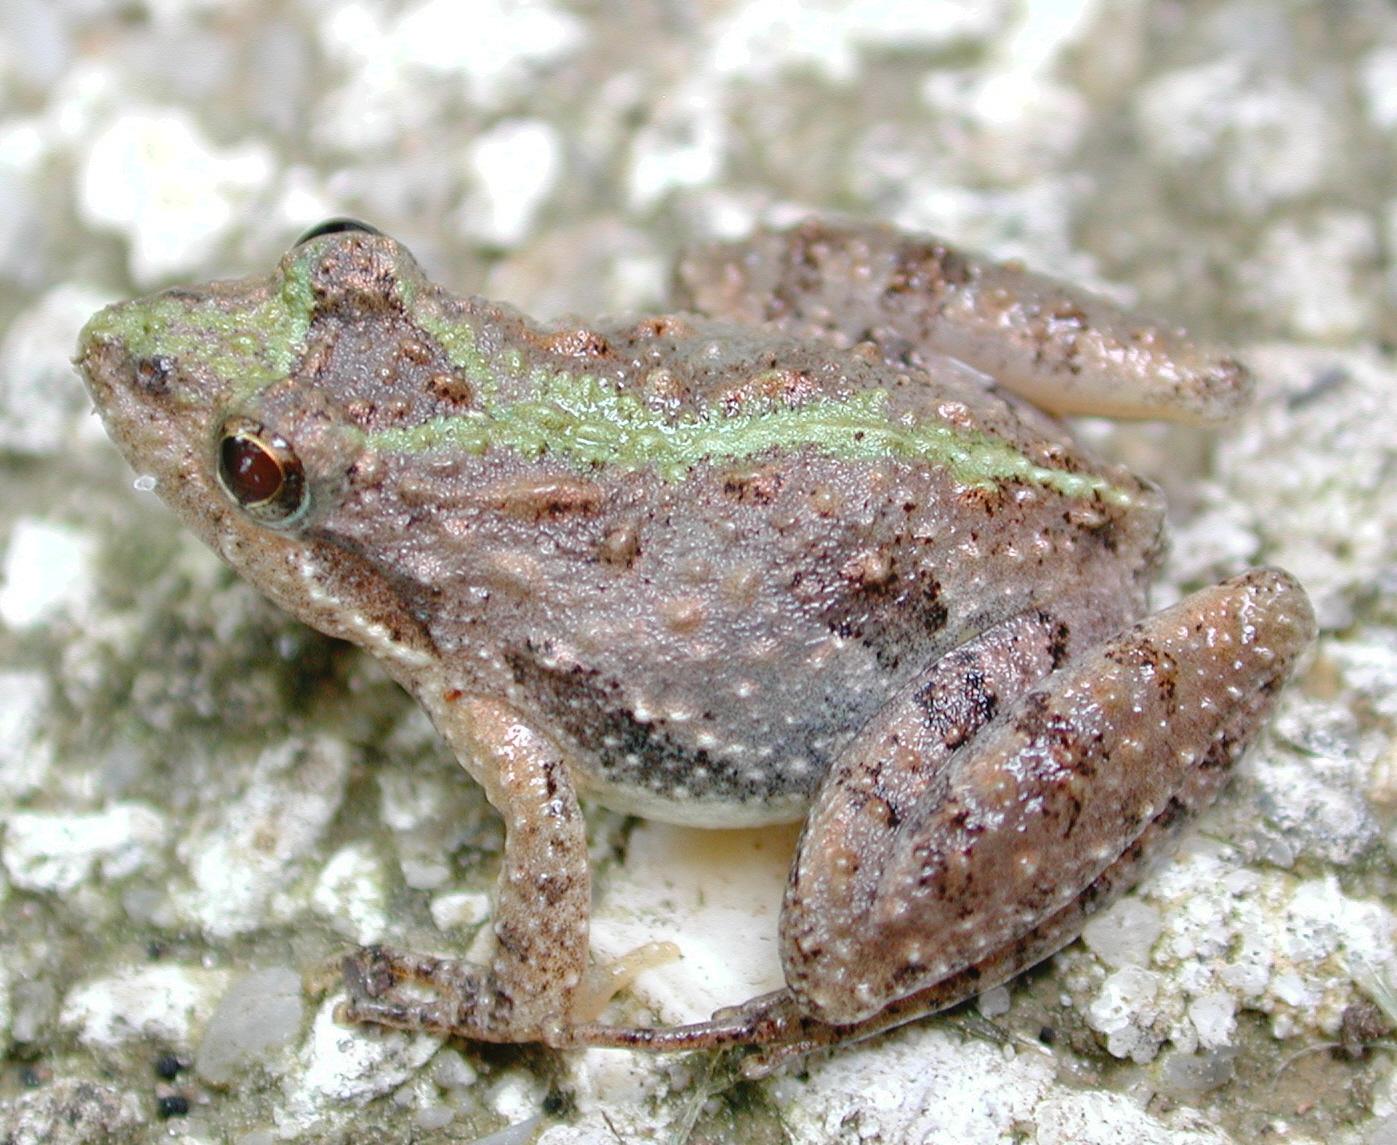 Southern Cricket Frog (Acris gryllus)